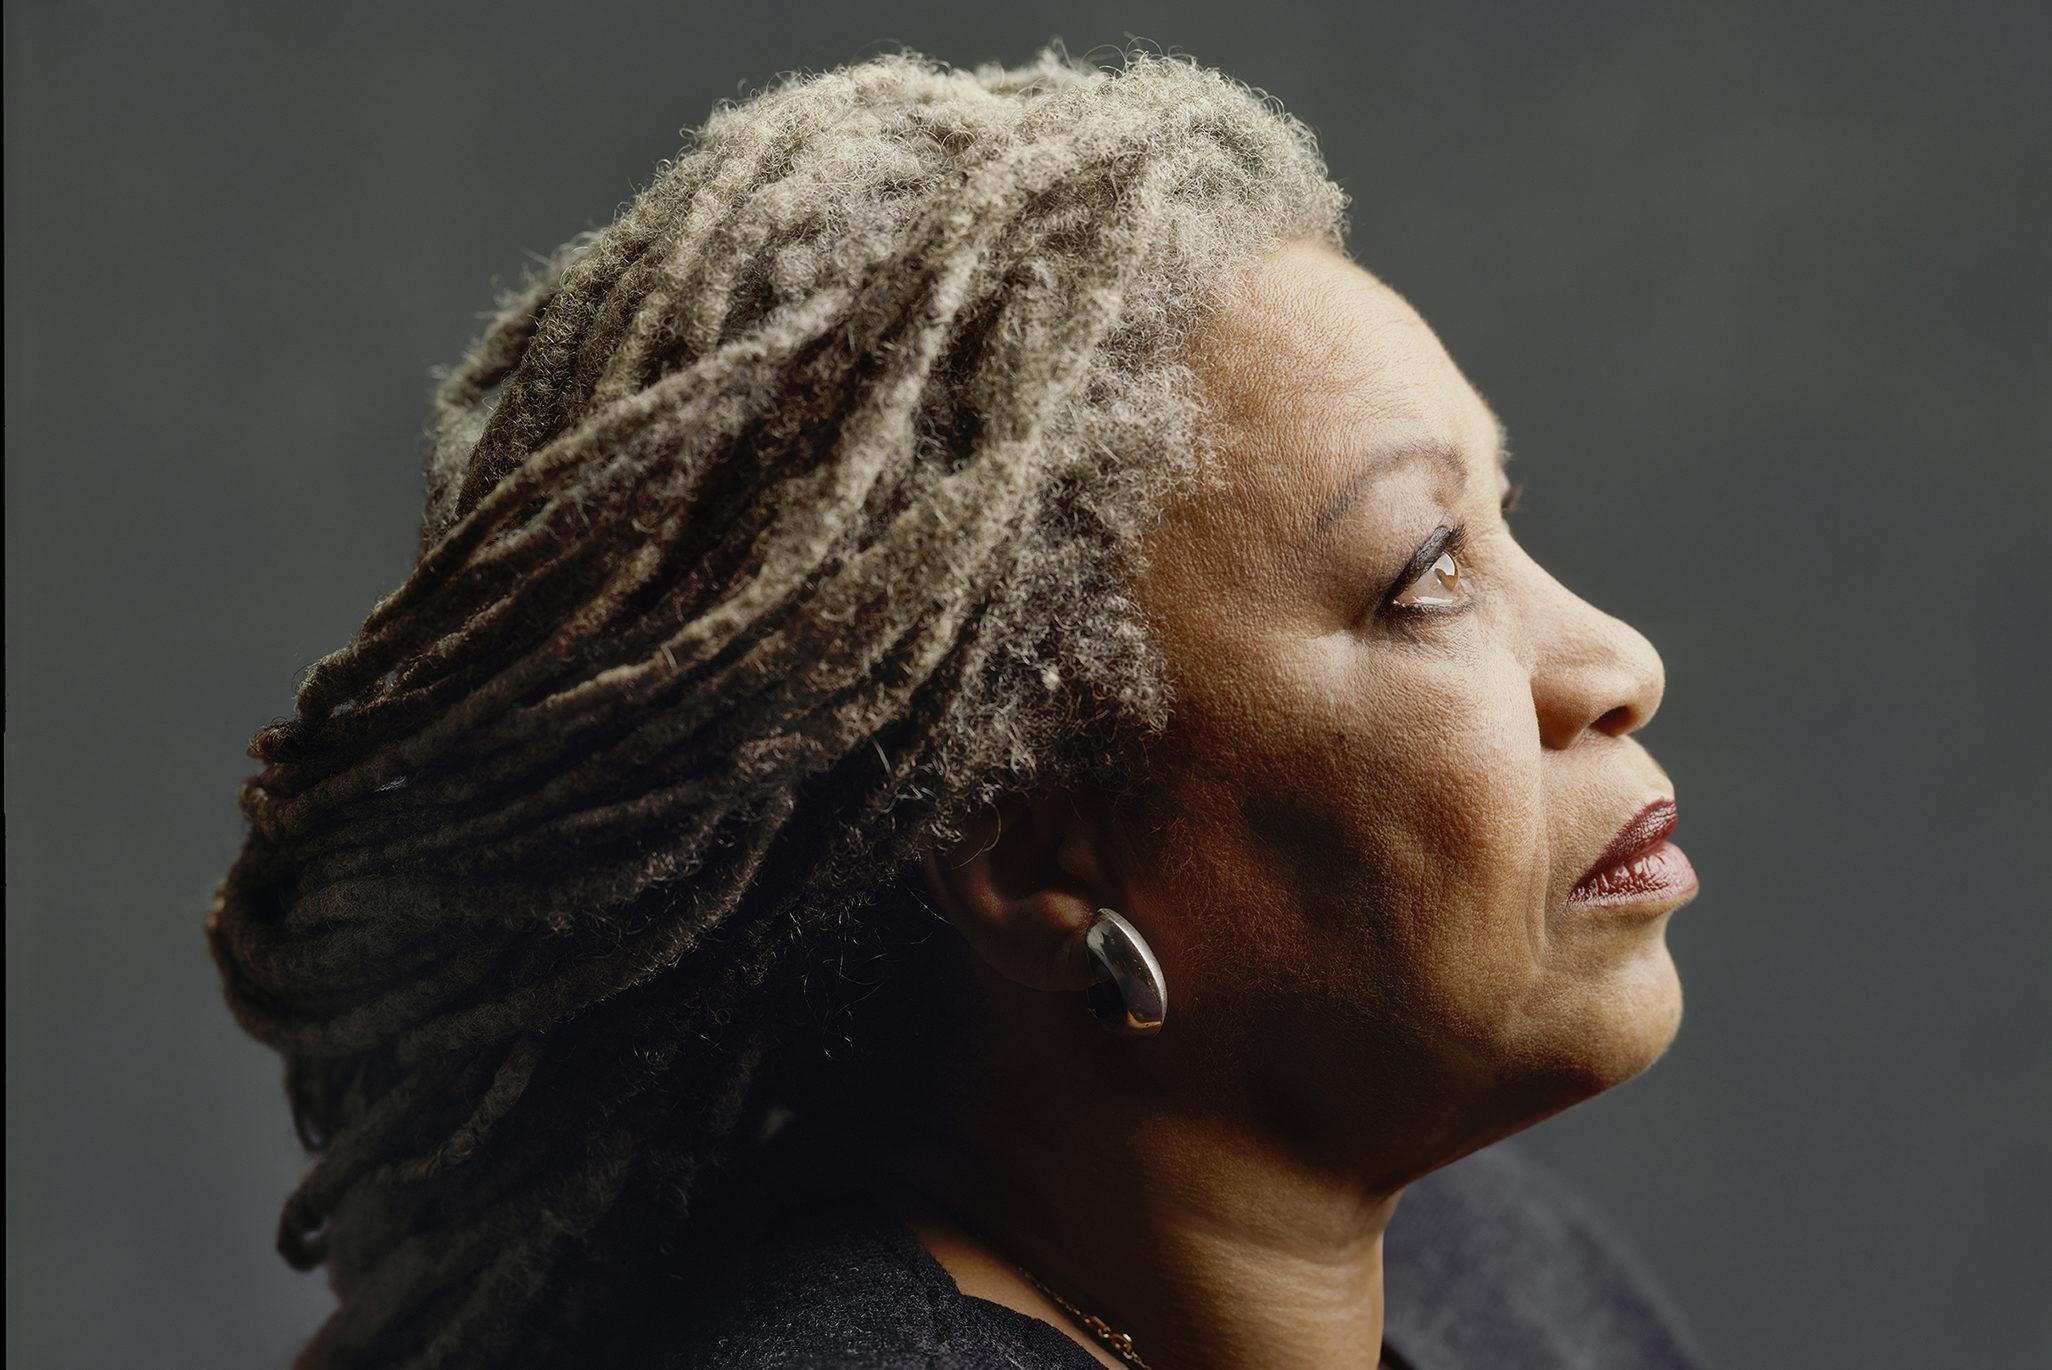 Toni Morrison kimdir? Toni Morrison öldü mü?